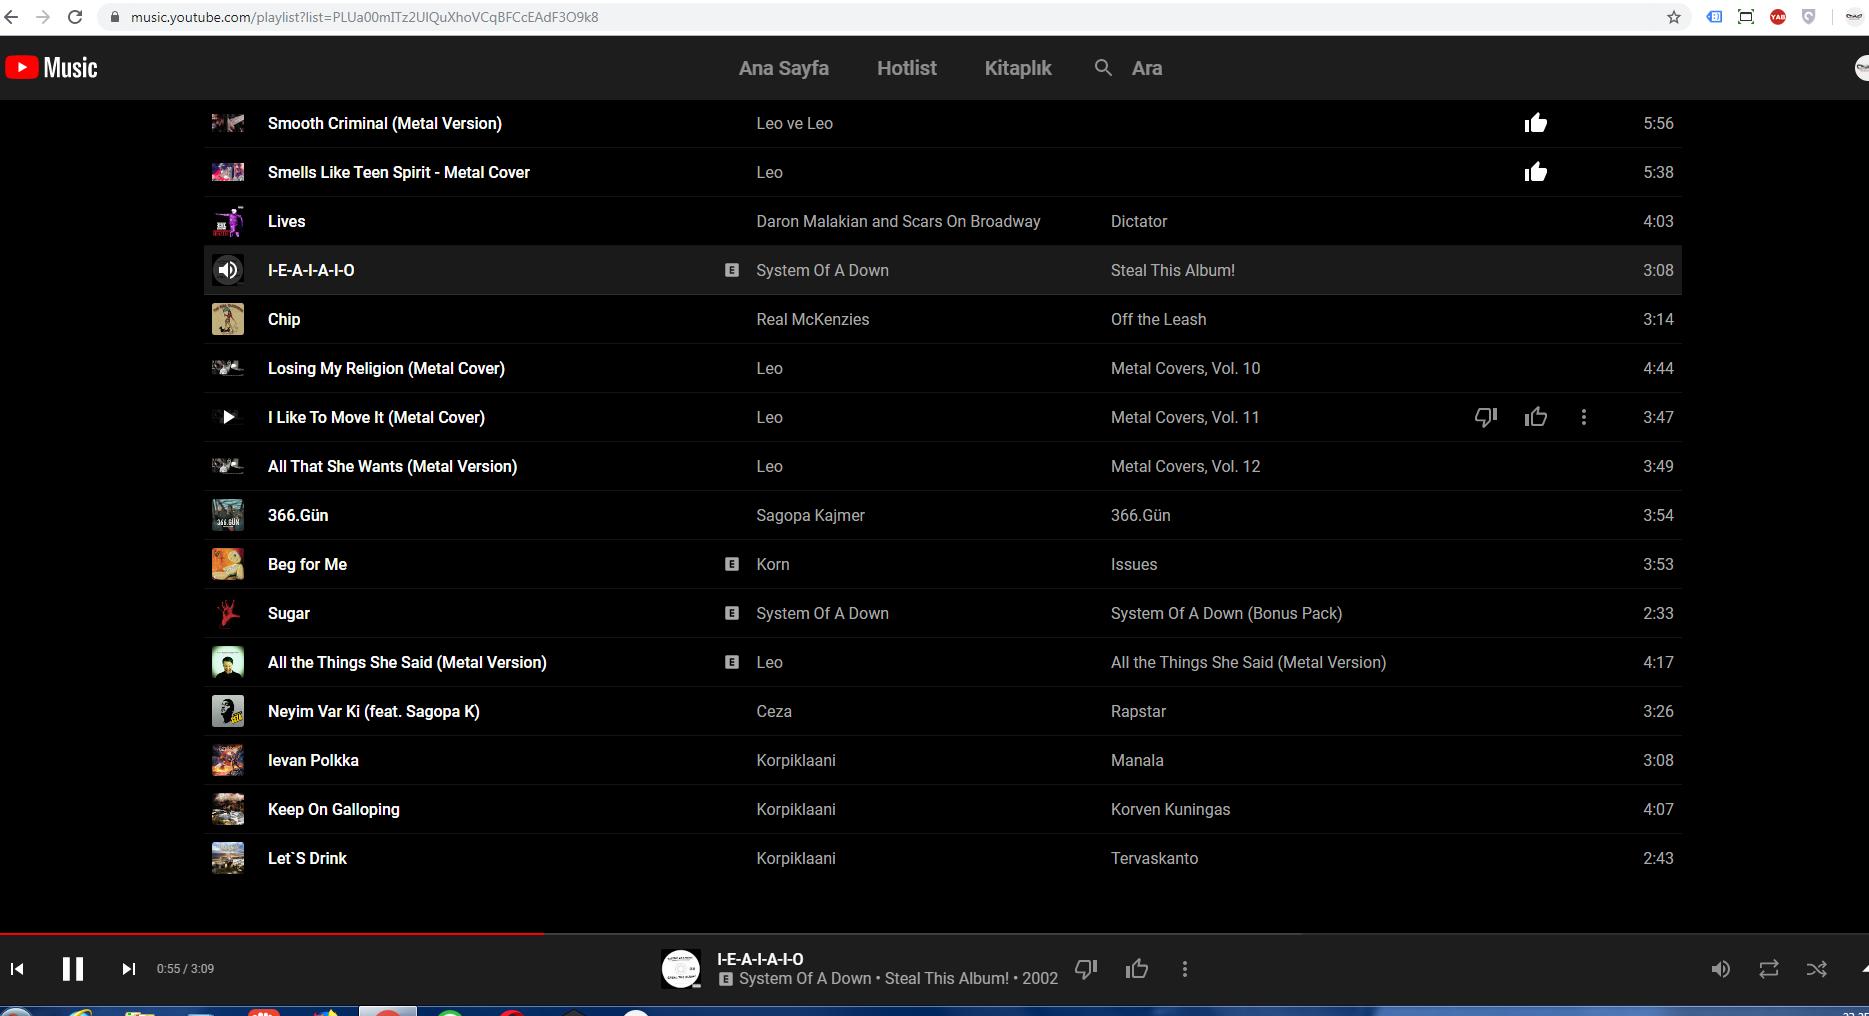 yt music listem.